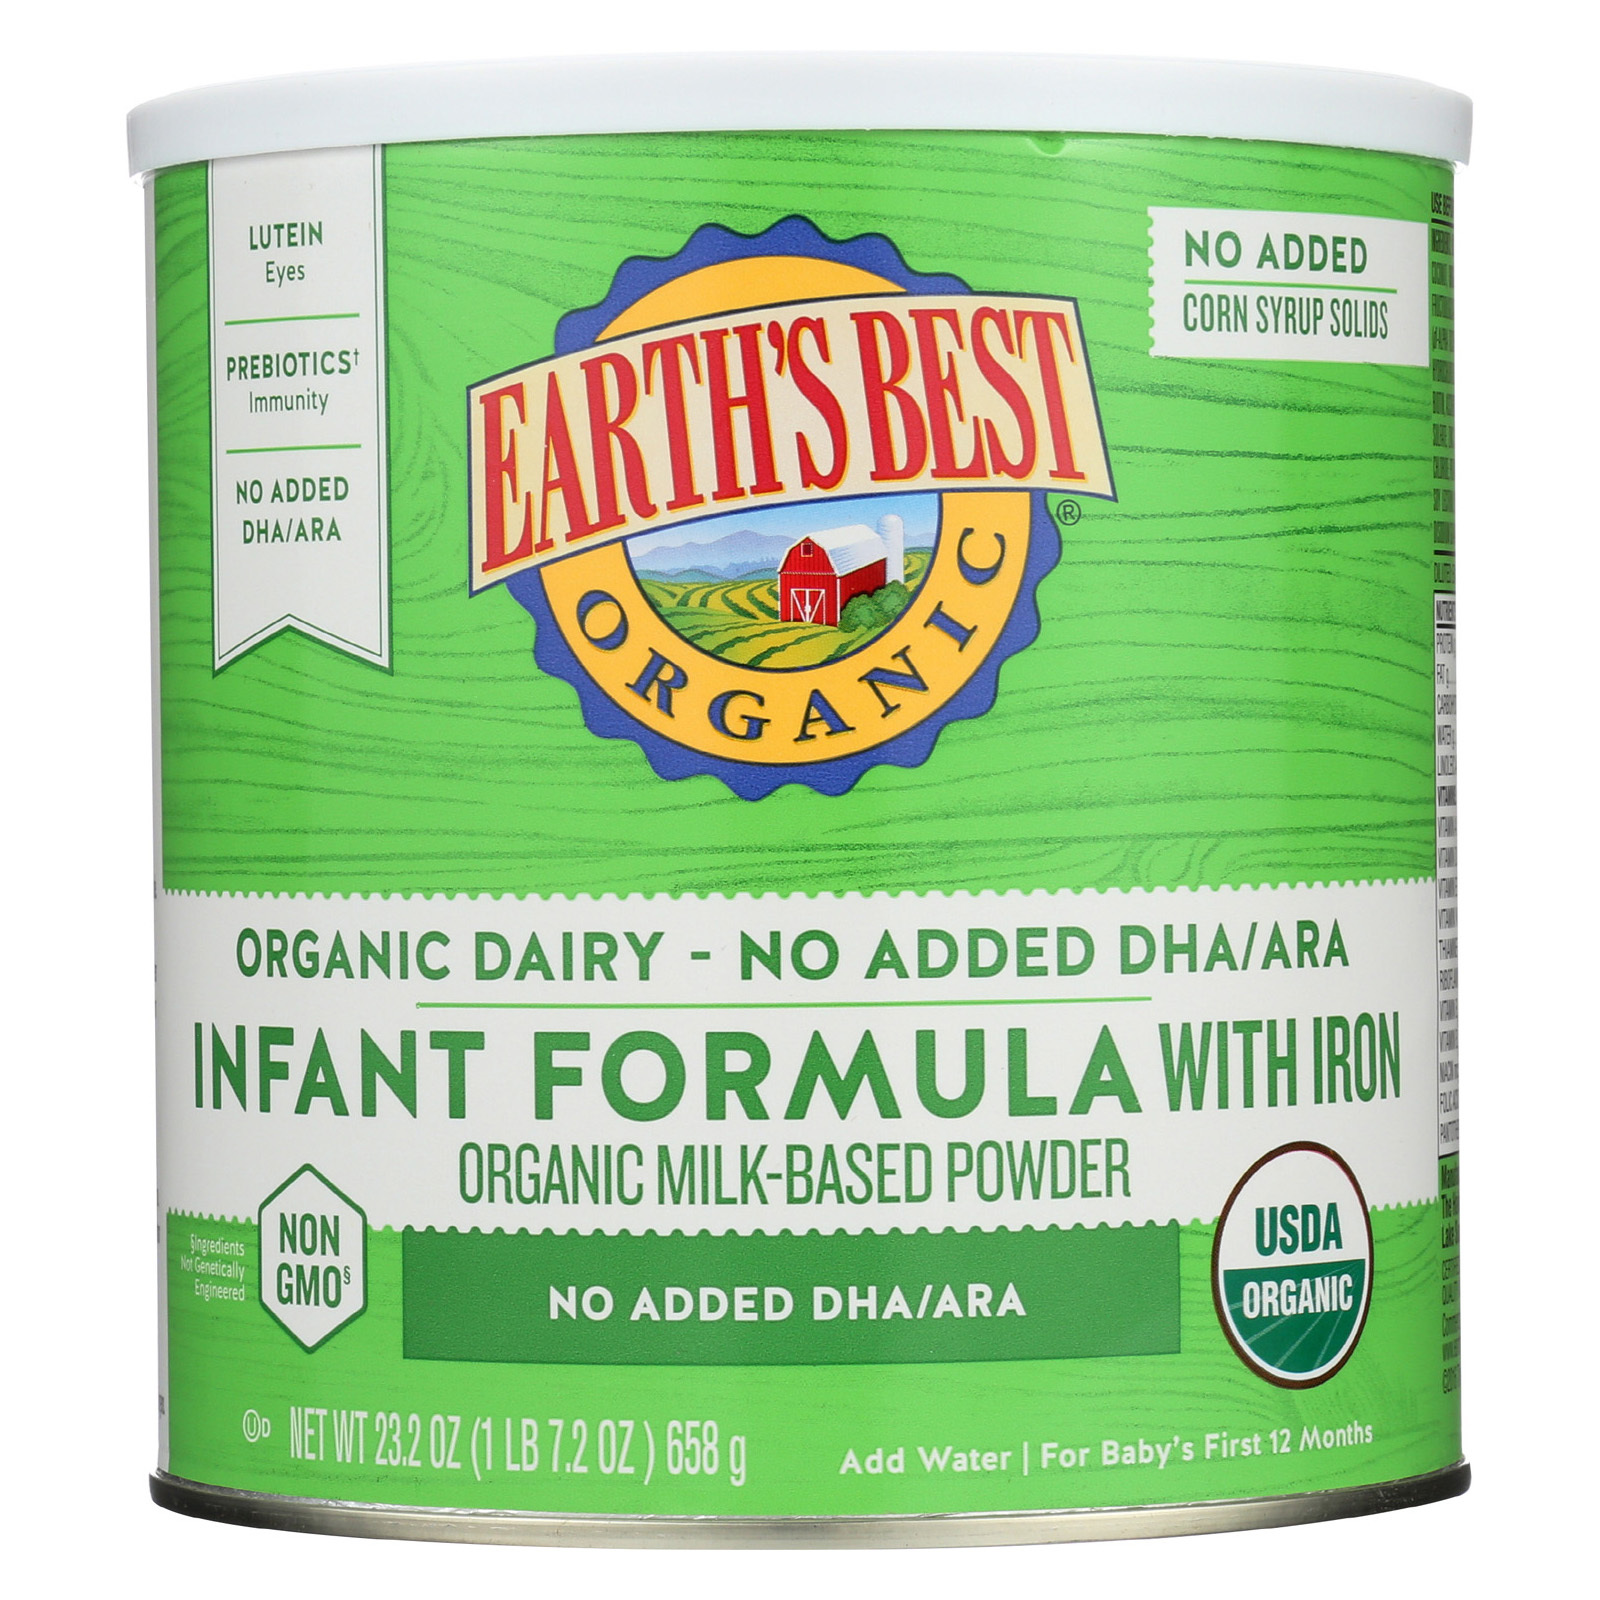 Earth's Best Infant Formula - Organic - Iron - Case of 4 - 23.2 oz